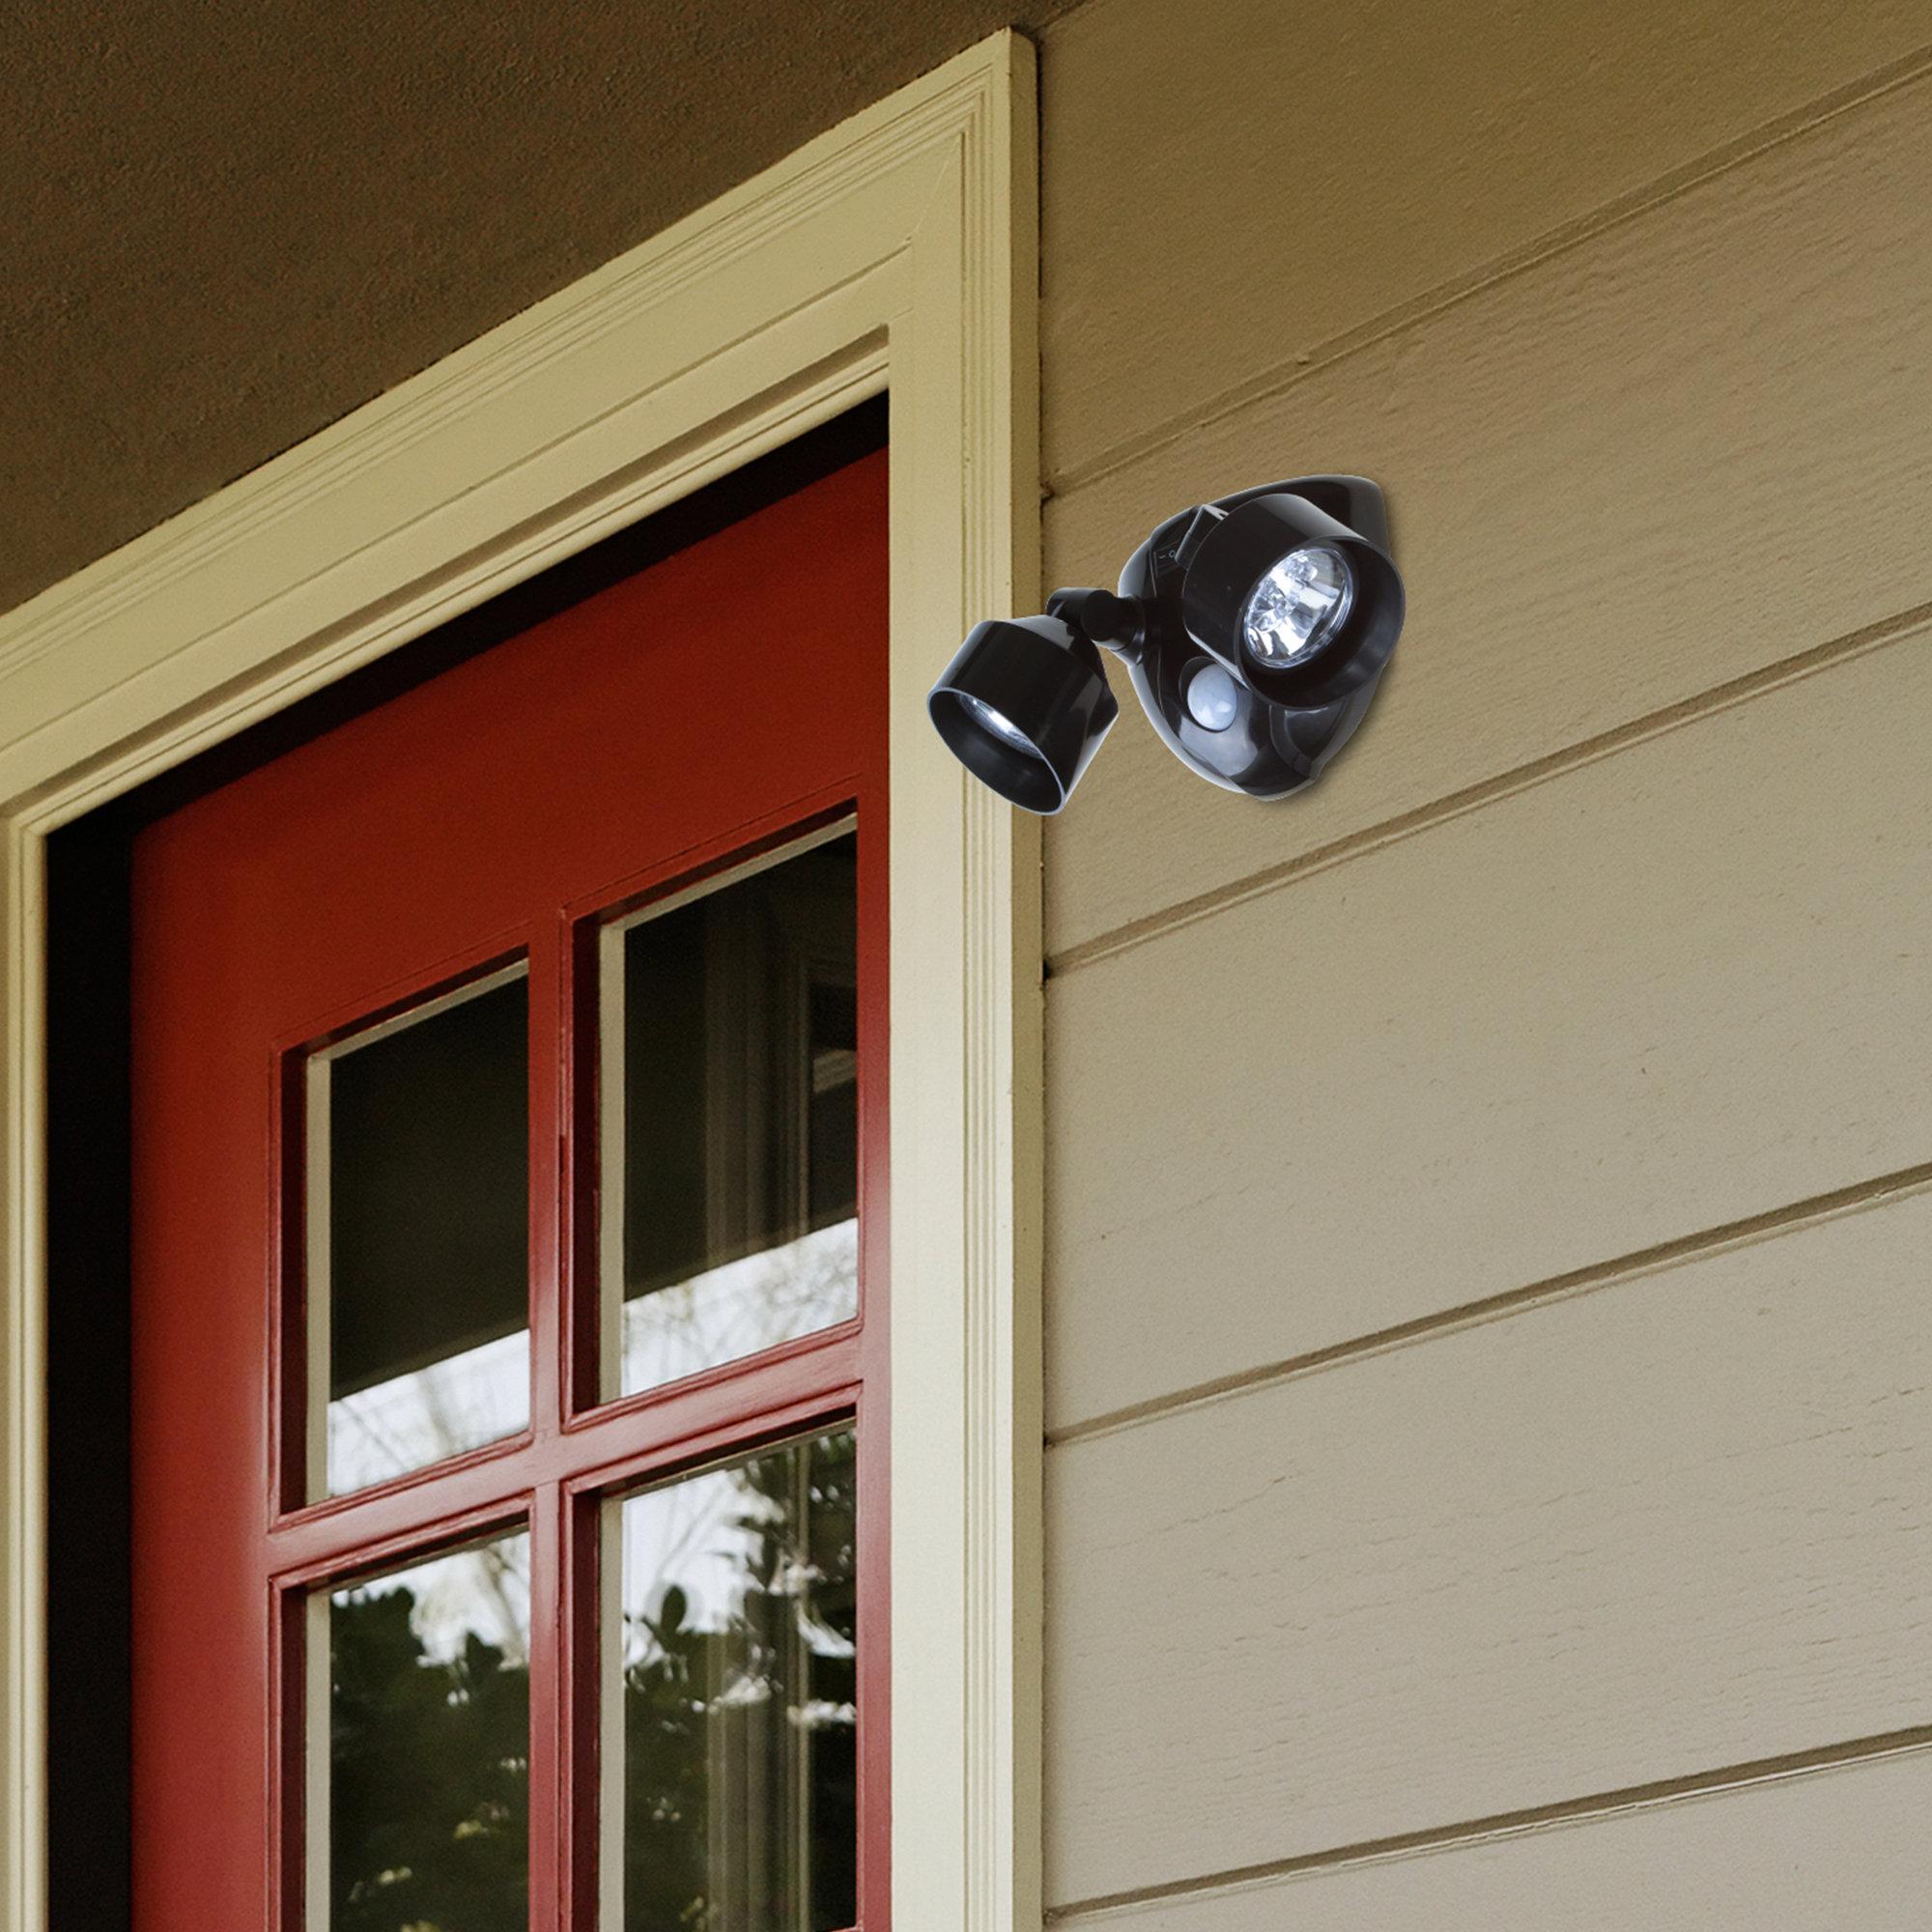 Everyday Home Led Outdoor Security Flood Light With Motion Sensor Reviews Wayfair